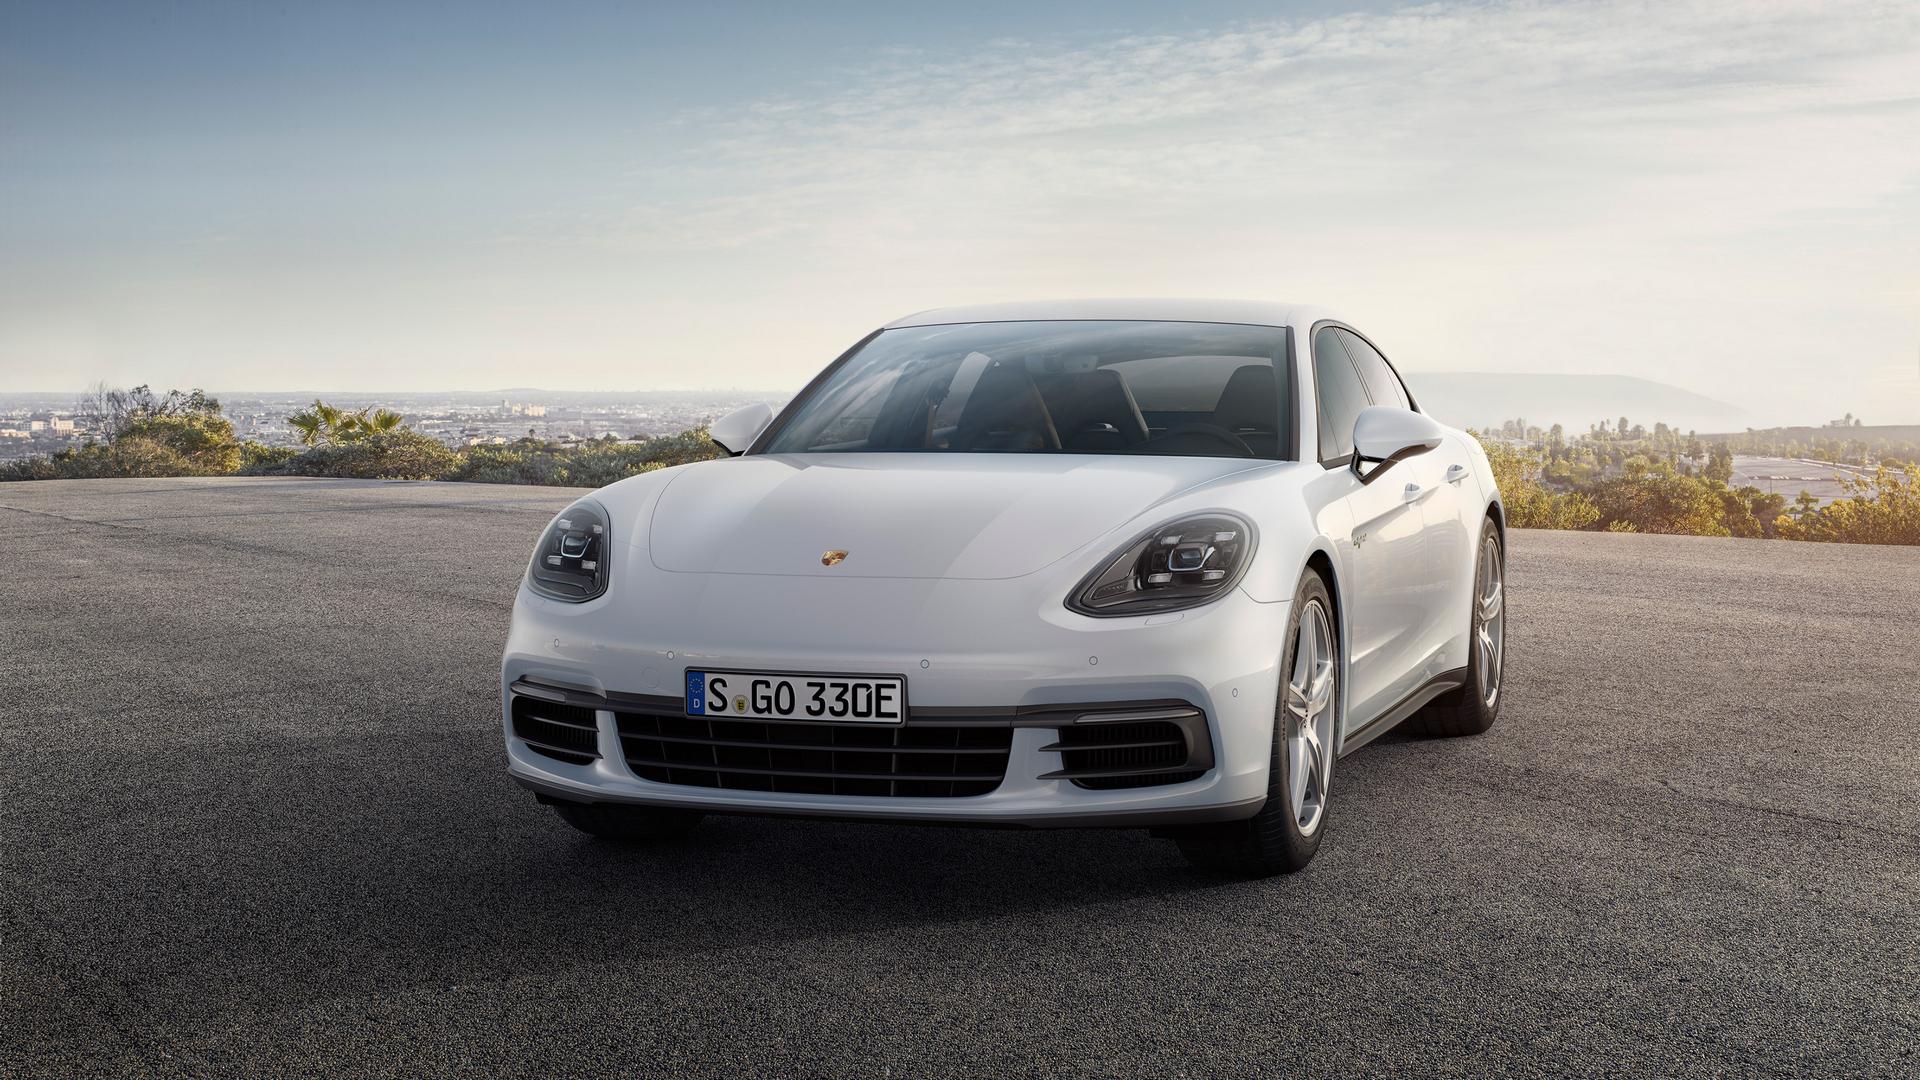 Panamera 4 E-Hybrid © Dr. Ing. h.c. F. Porsche AG